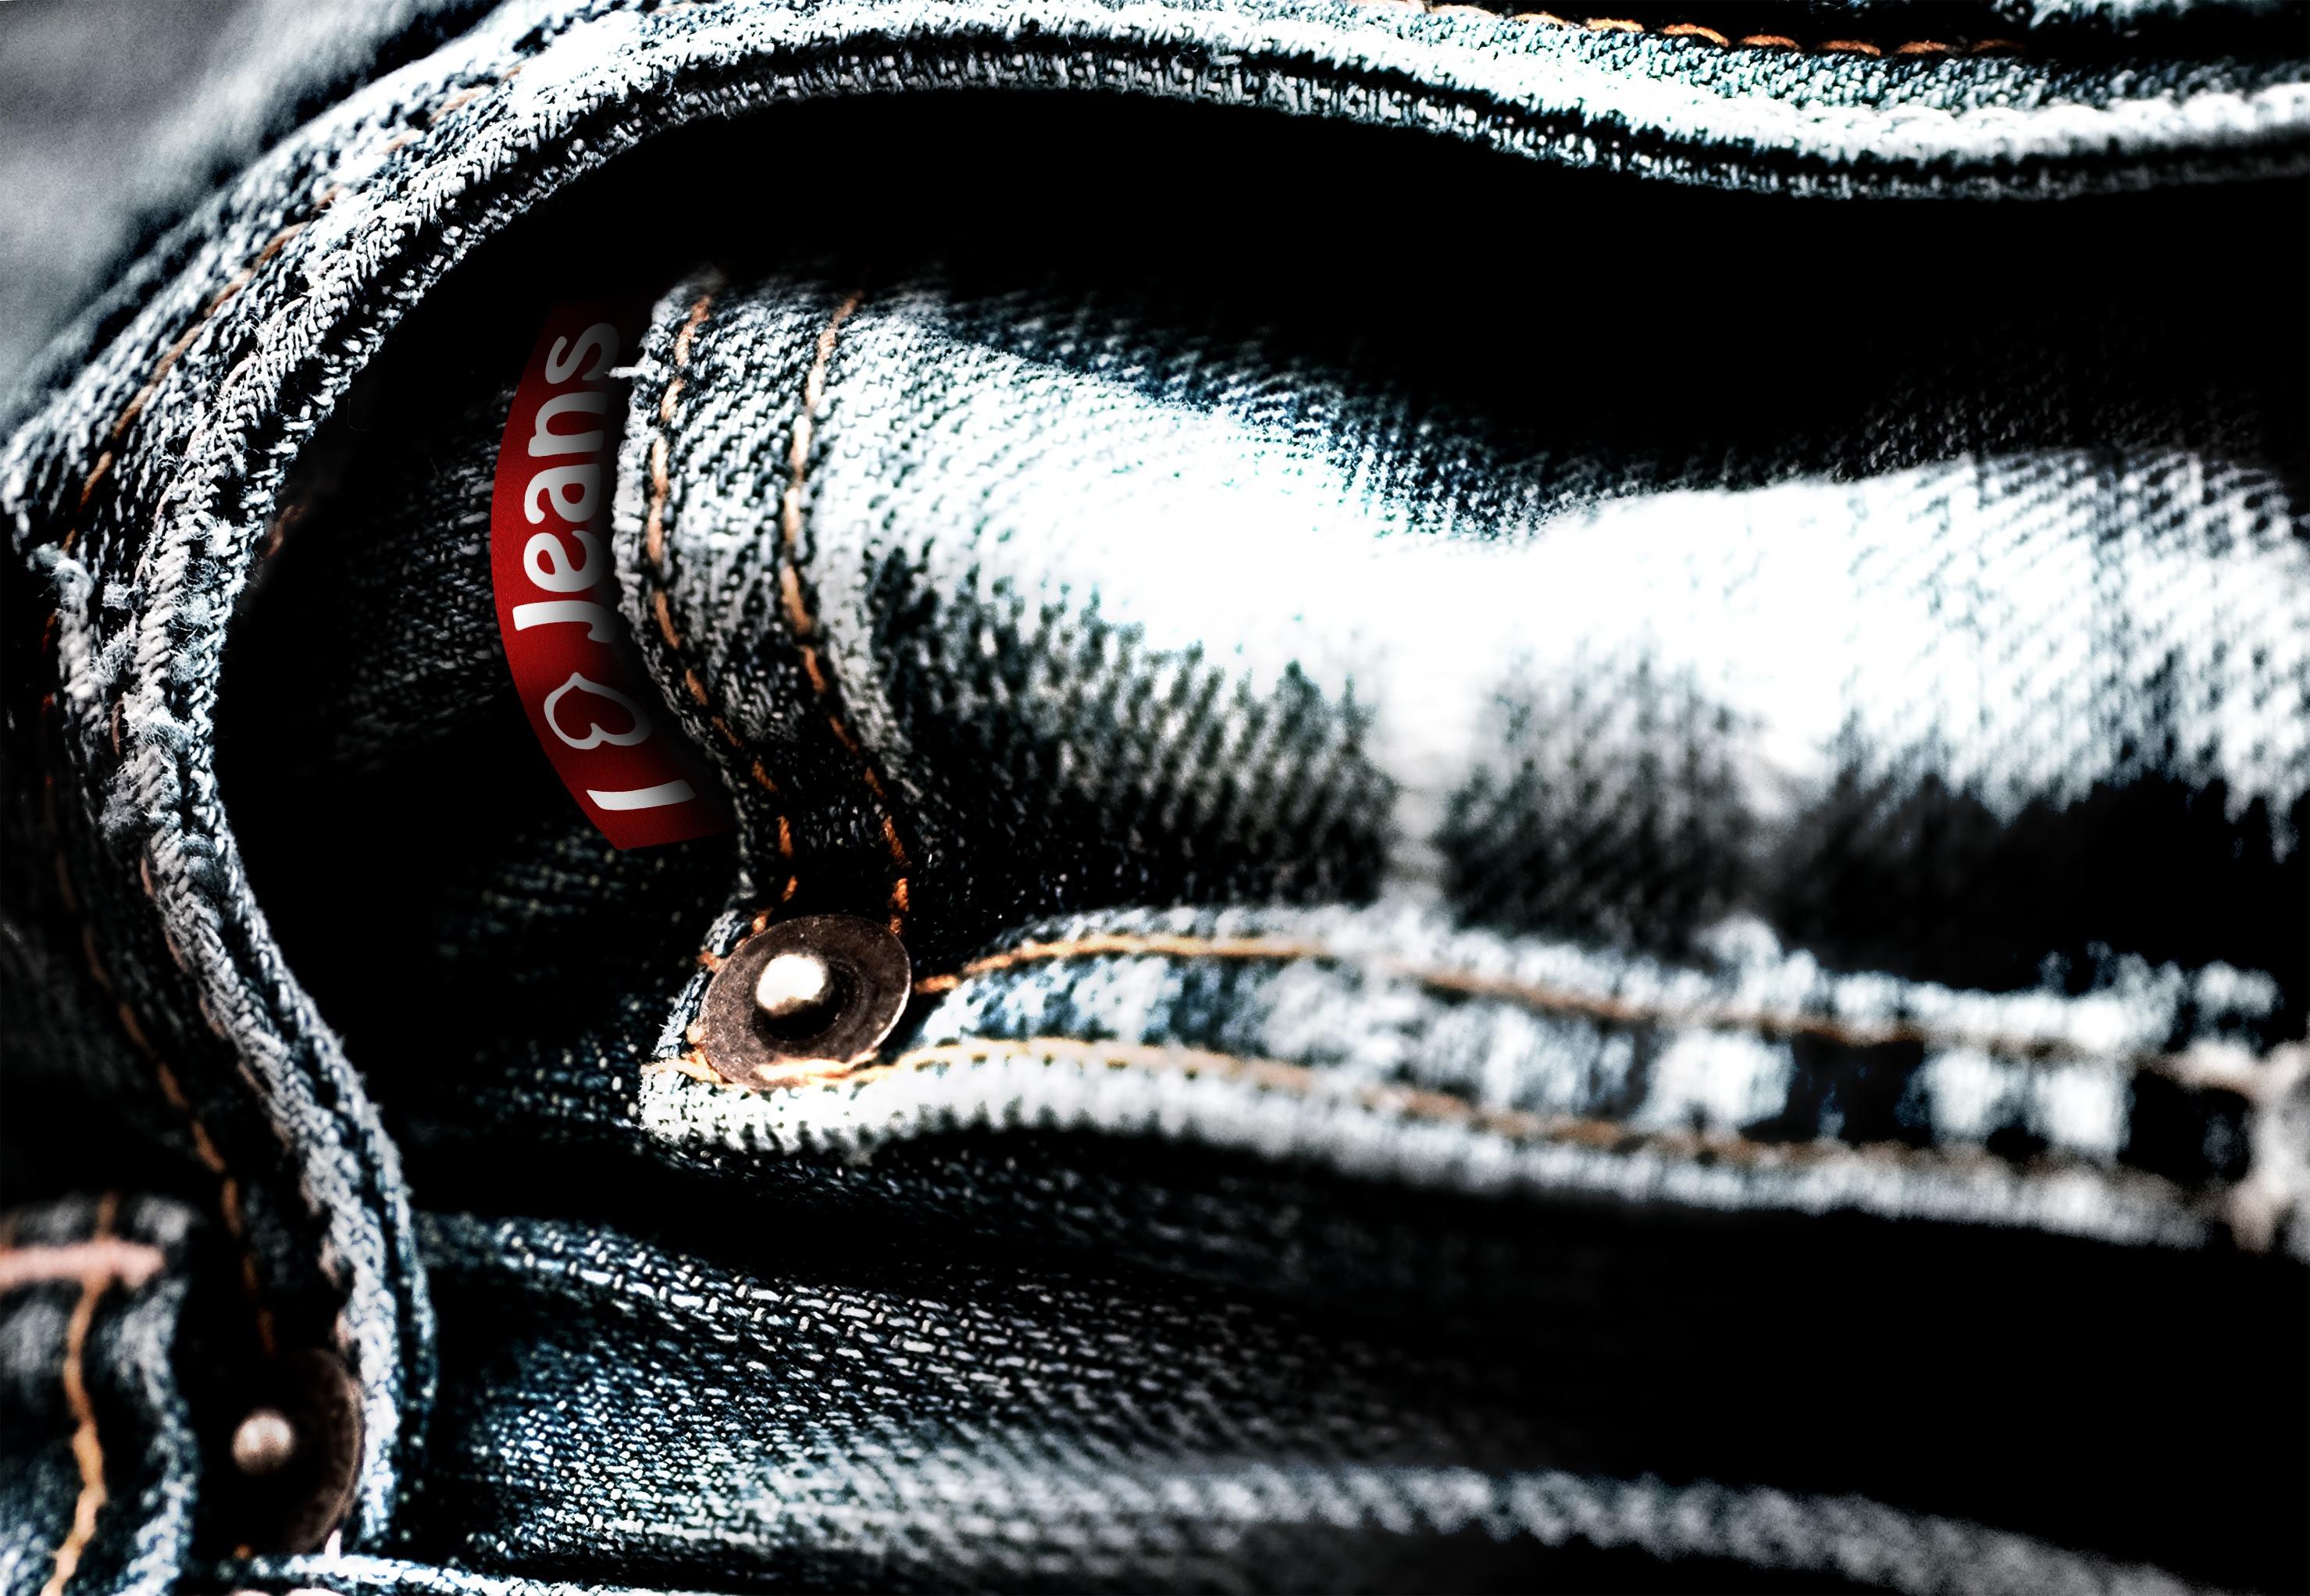 Fotos Gratis Fotografia Cadena Pantalones Rojo Bolso Moda Azul Ropa Negro Neumatico Mezclilla Prenda Tela De Cerca Pasado Logo Usado Fotografia Macro Lavado Ebv Lavado A La Piedra Bypass De Blanqueo